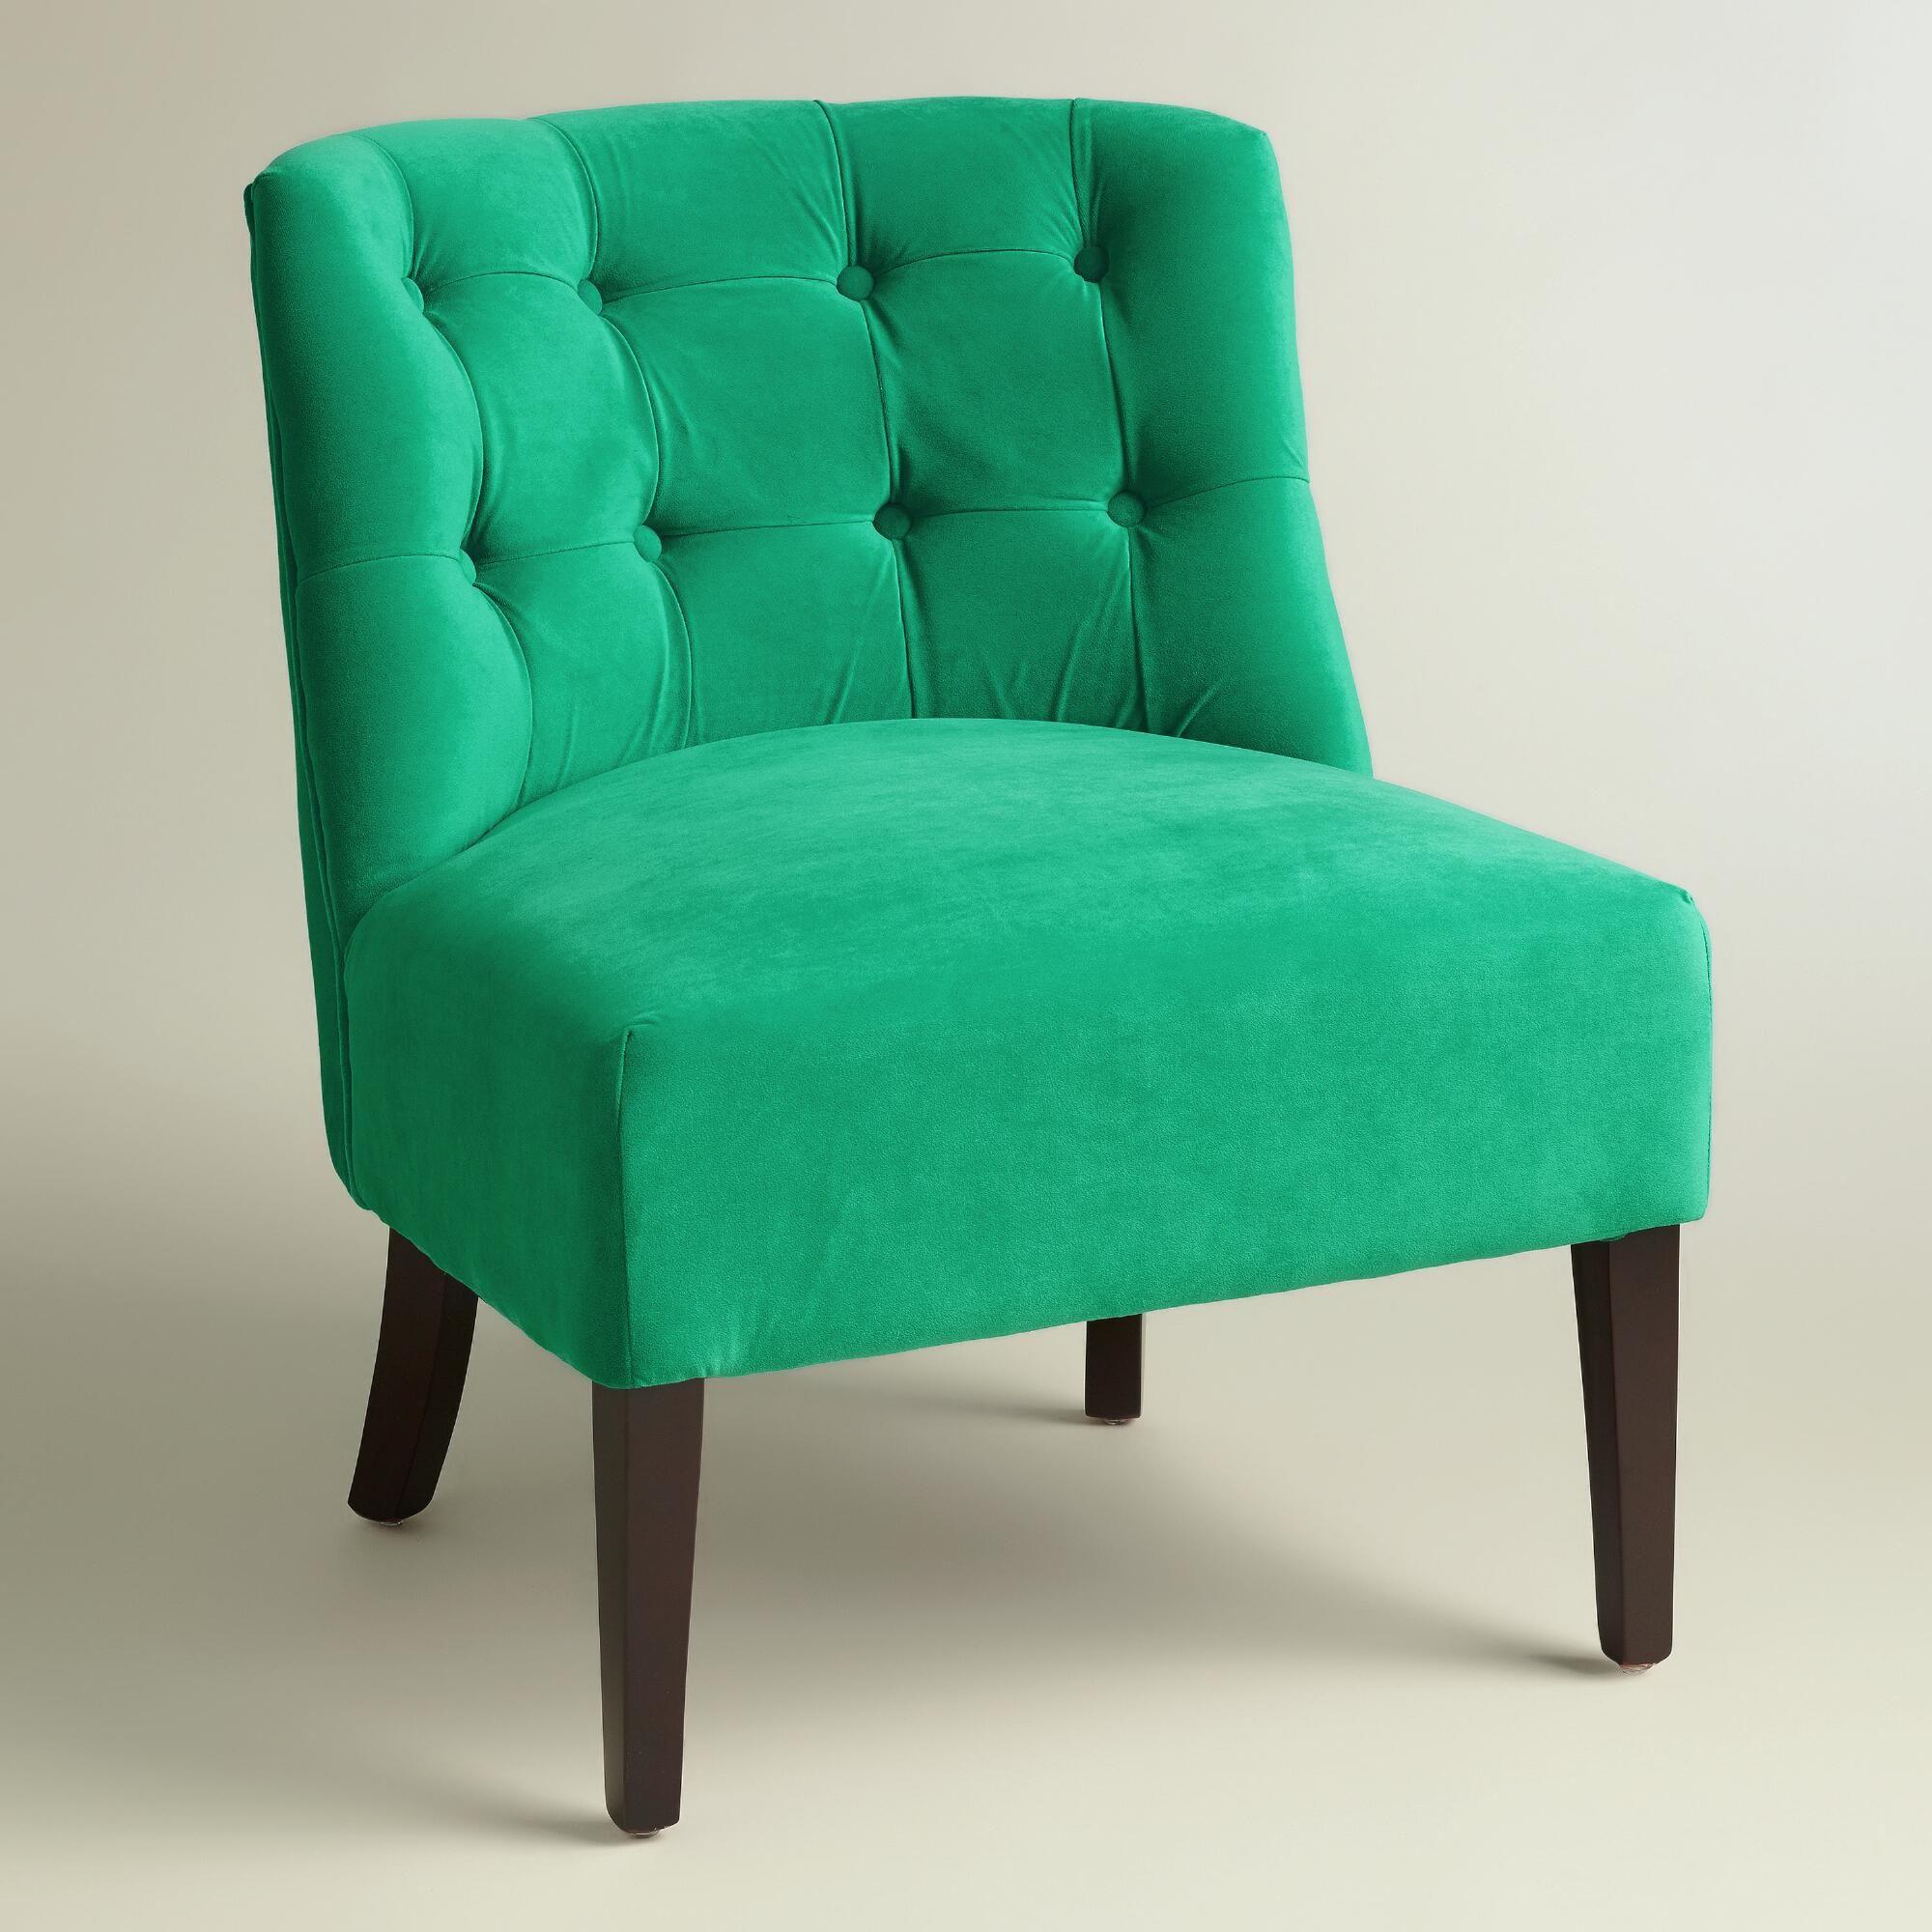 Emerald Green Lindsey Chair World Market Living room